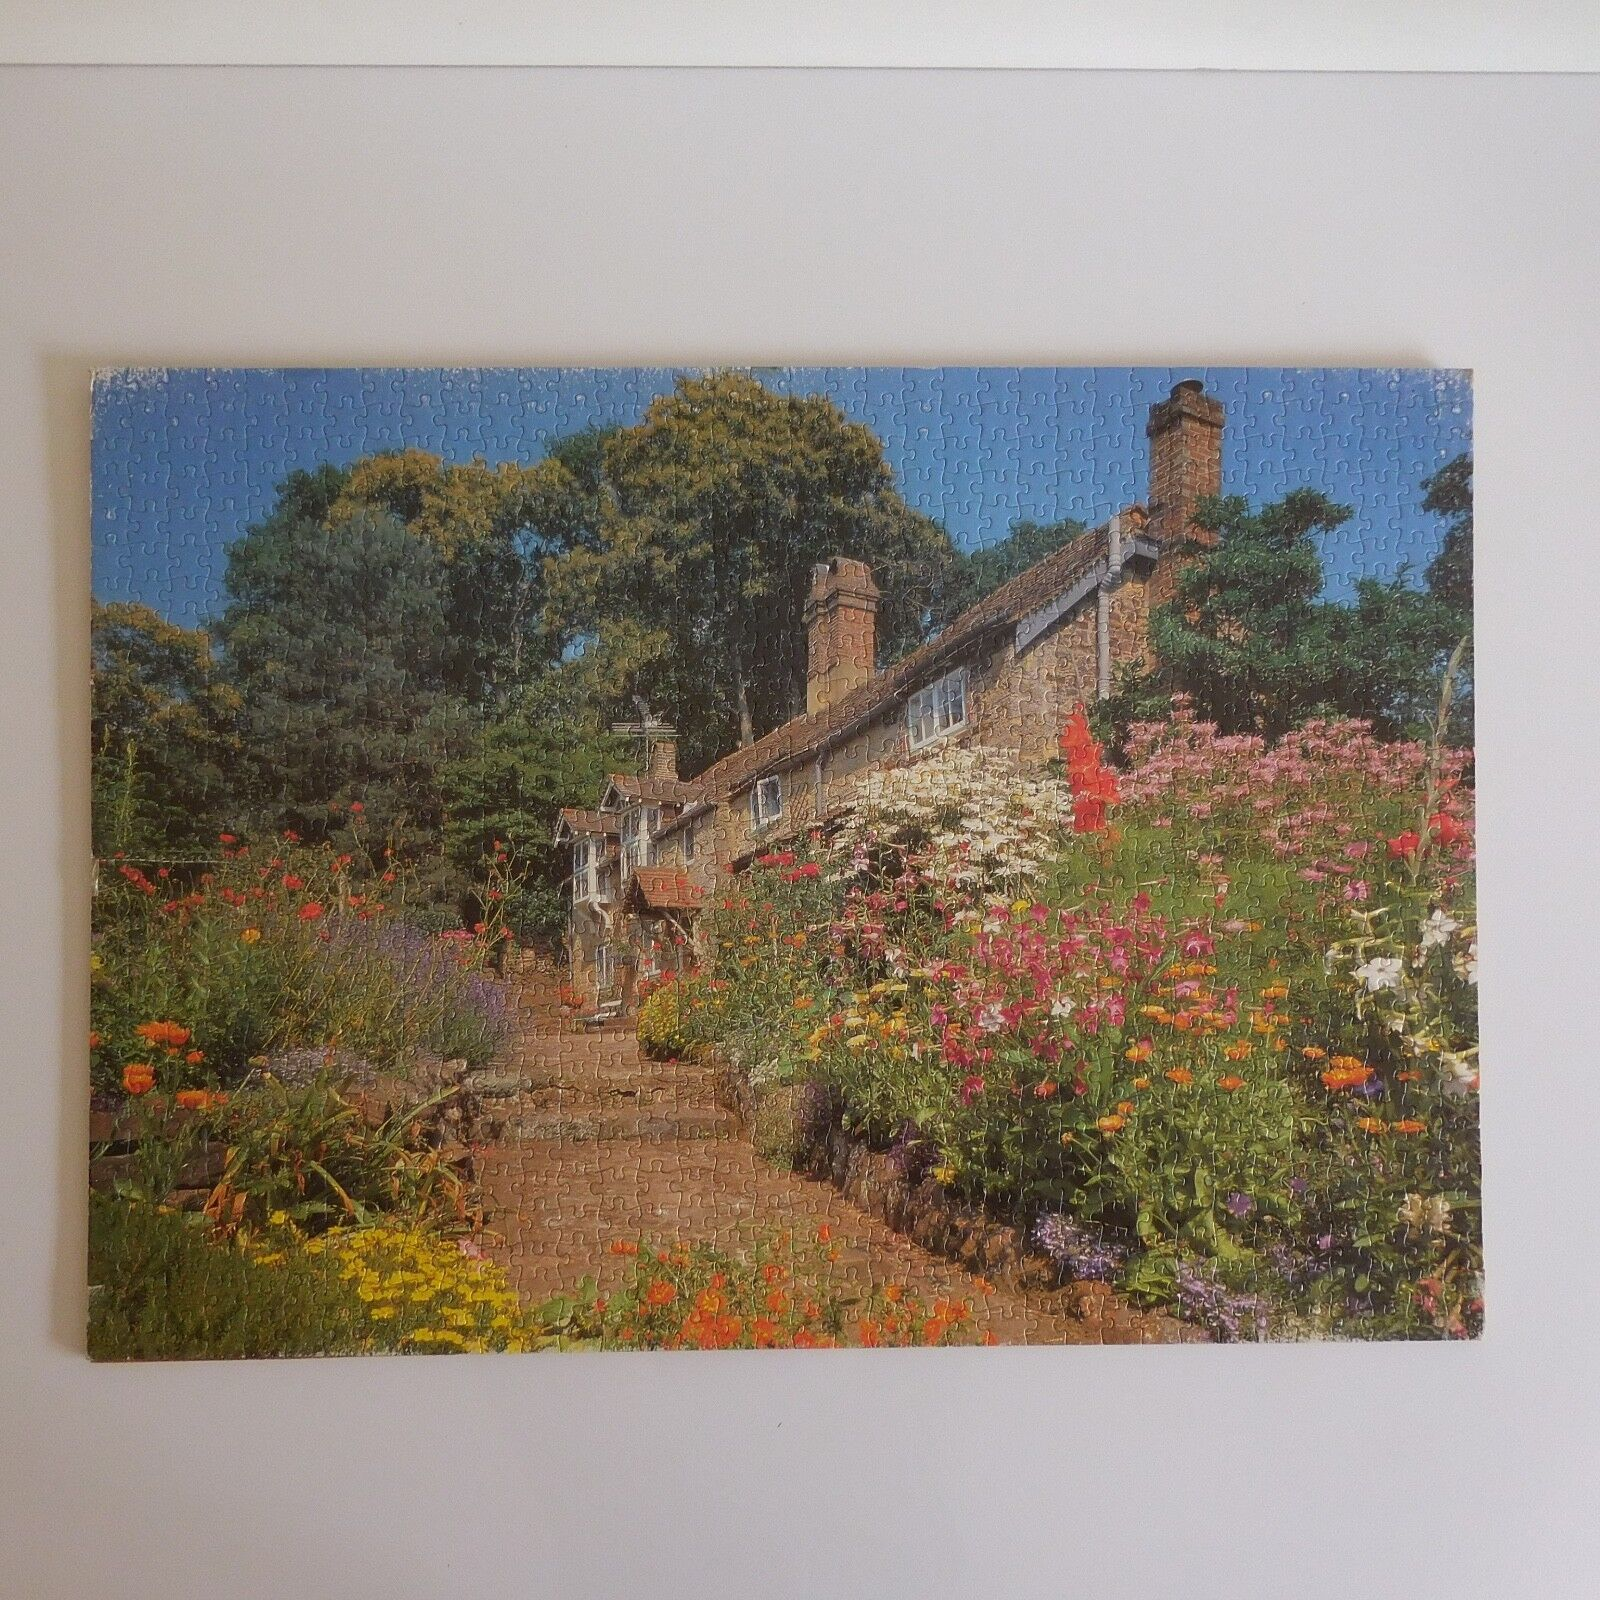 Puzzle Hogar Mano IN 1968 Mirecourt Barbilla Art Decoración Candelabros Pn